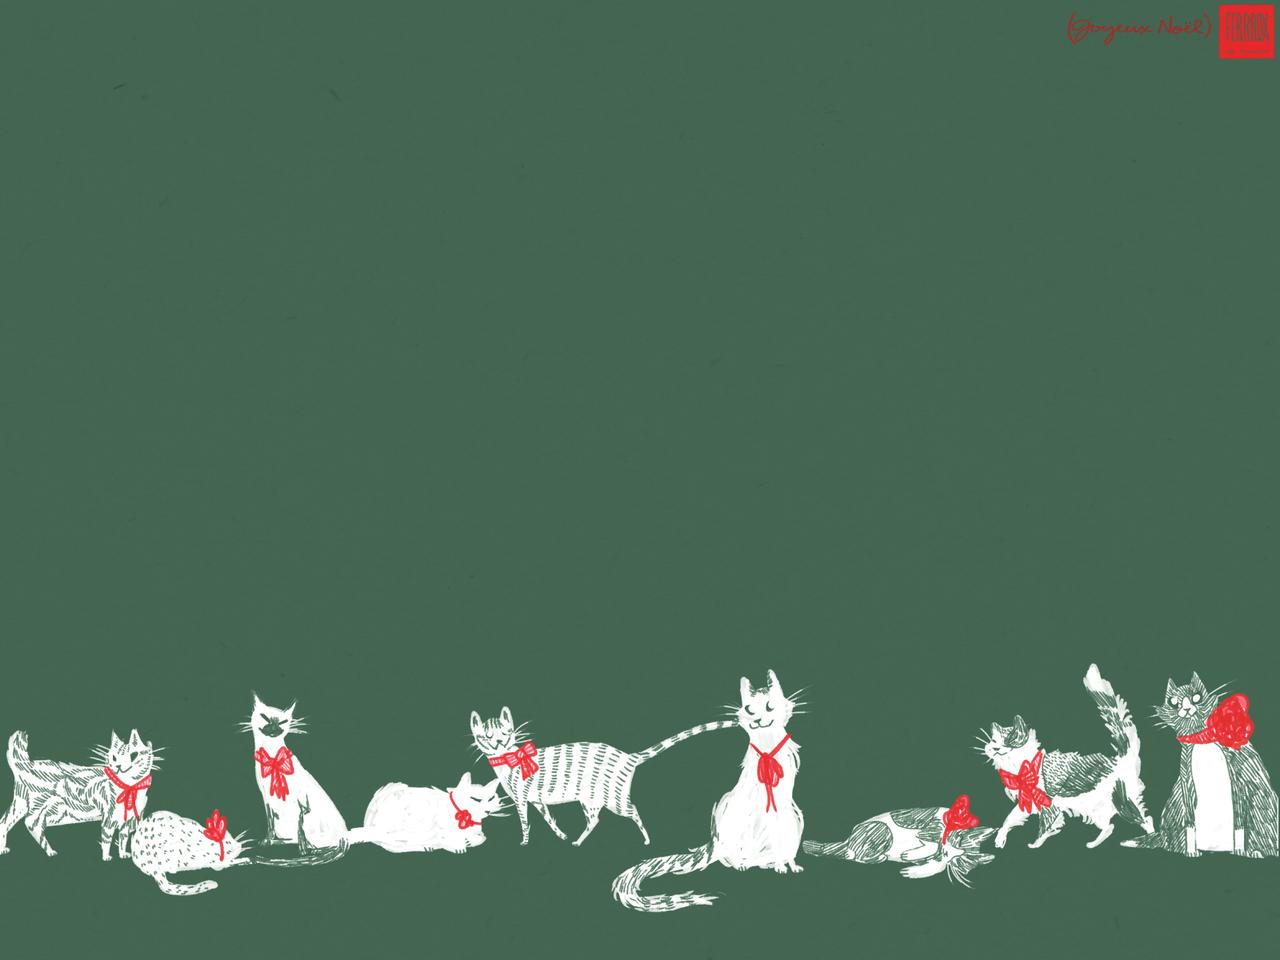 48 Christmas Wallpaper Tumblr On Wallpapersafari